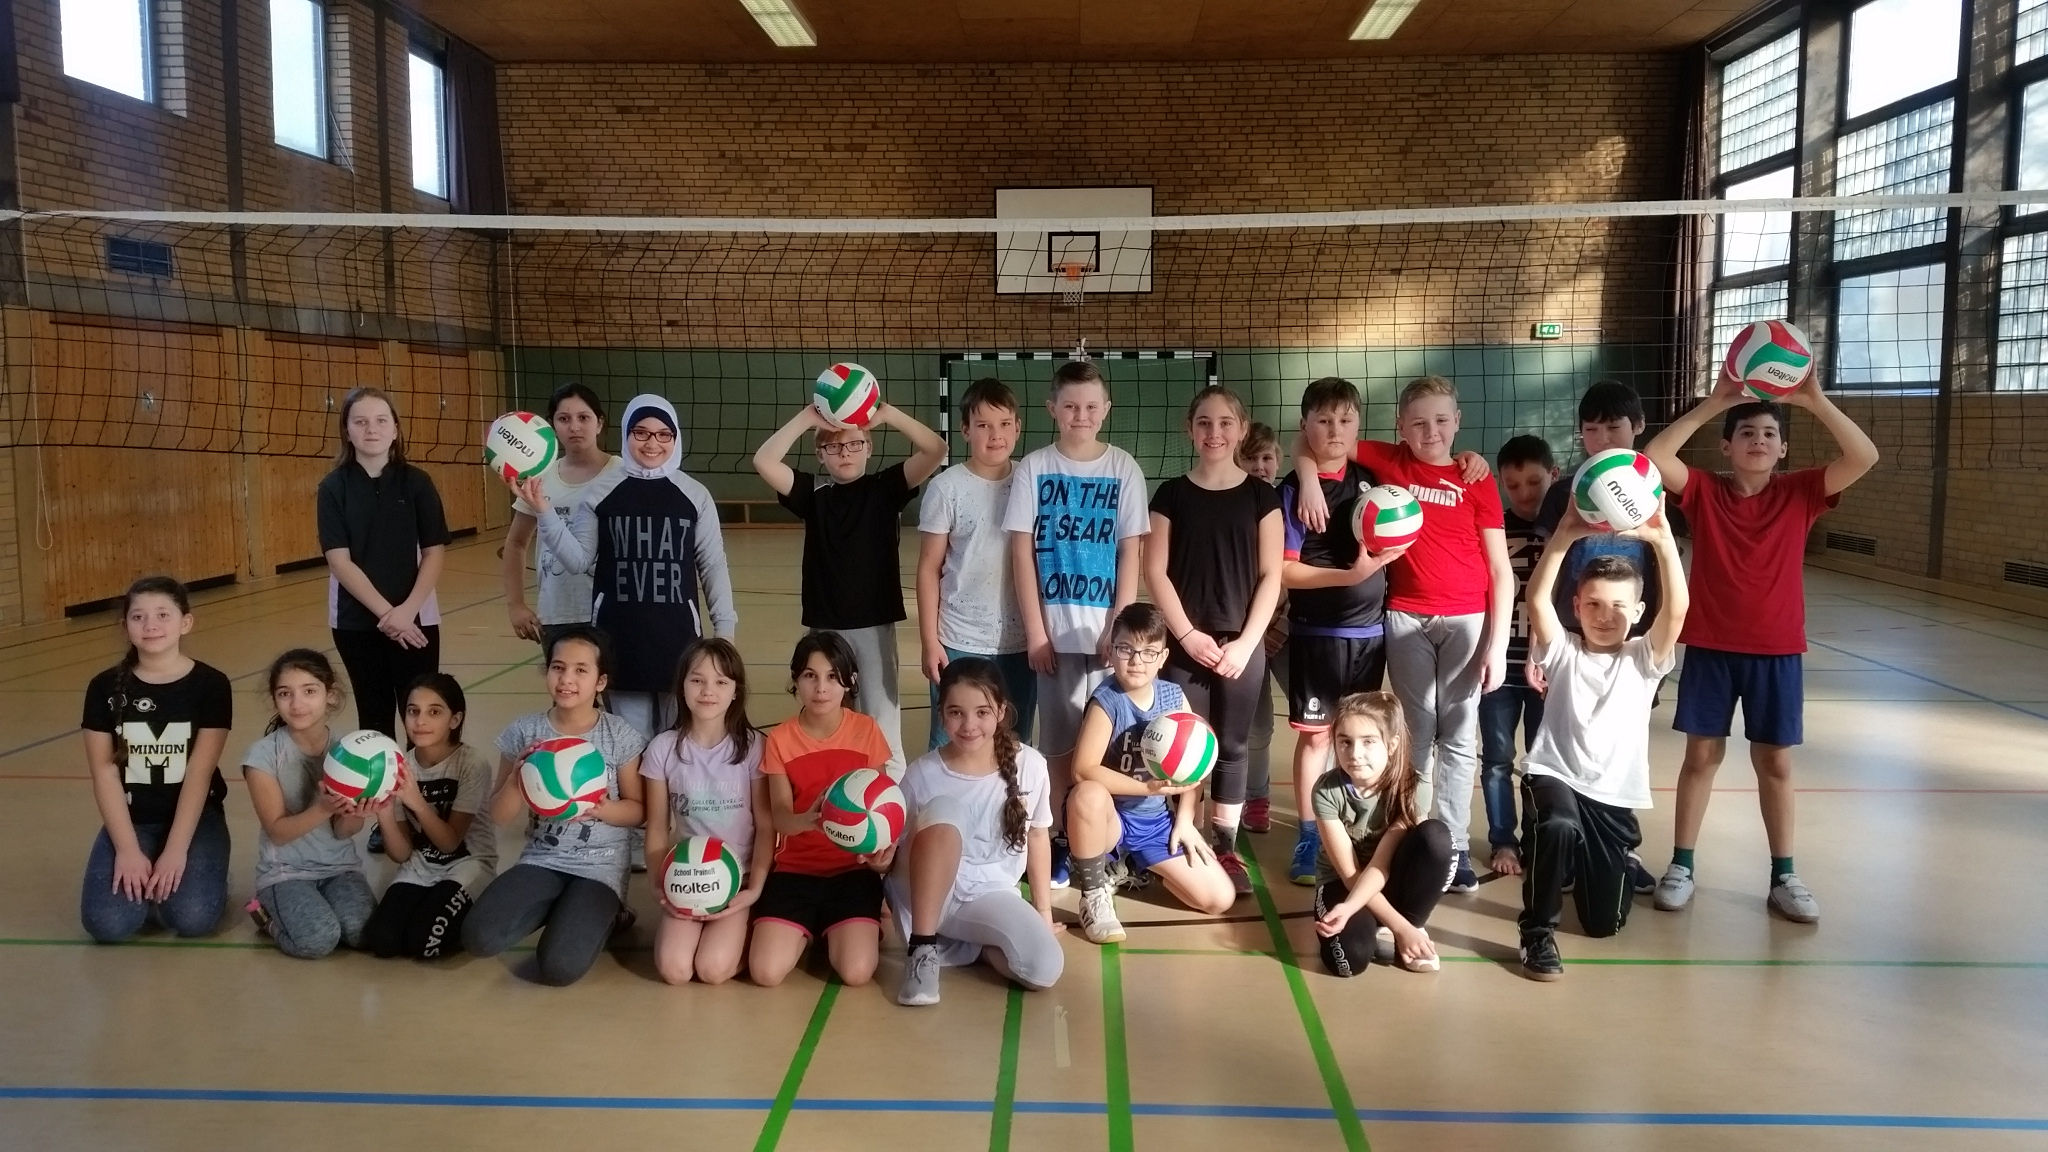 Volleyball-Projekt